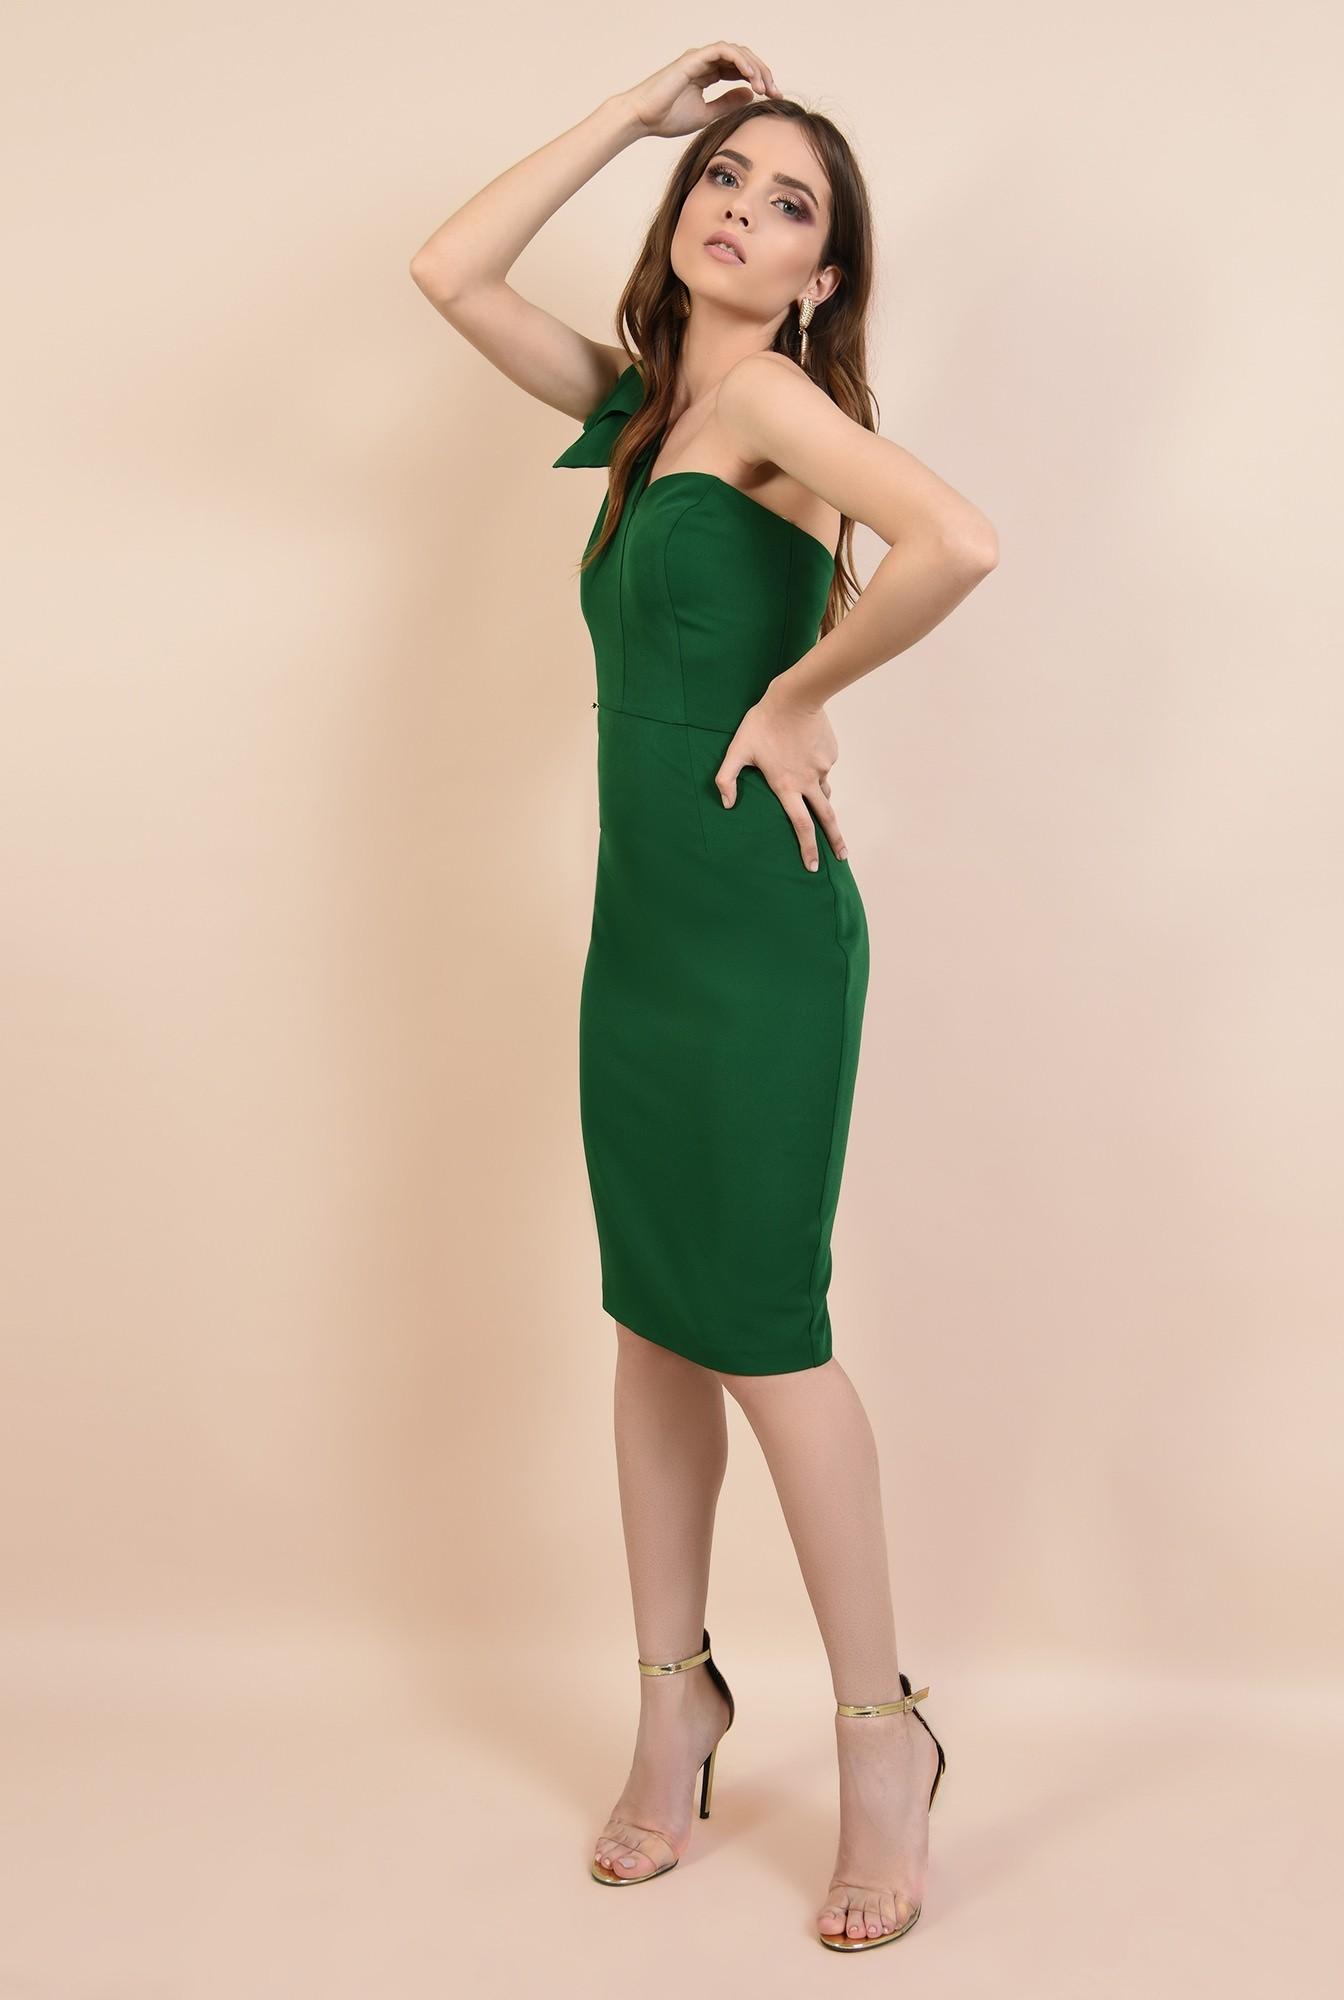 3 - rochie de ocazie, verde, clepsidra, funde la umar, rochii elegante online